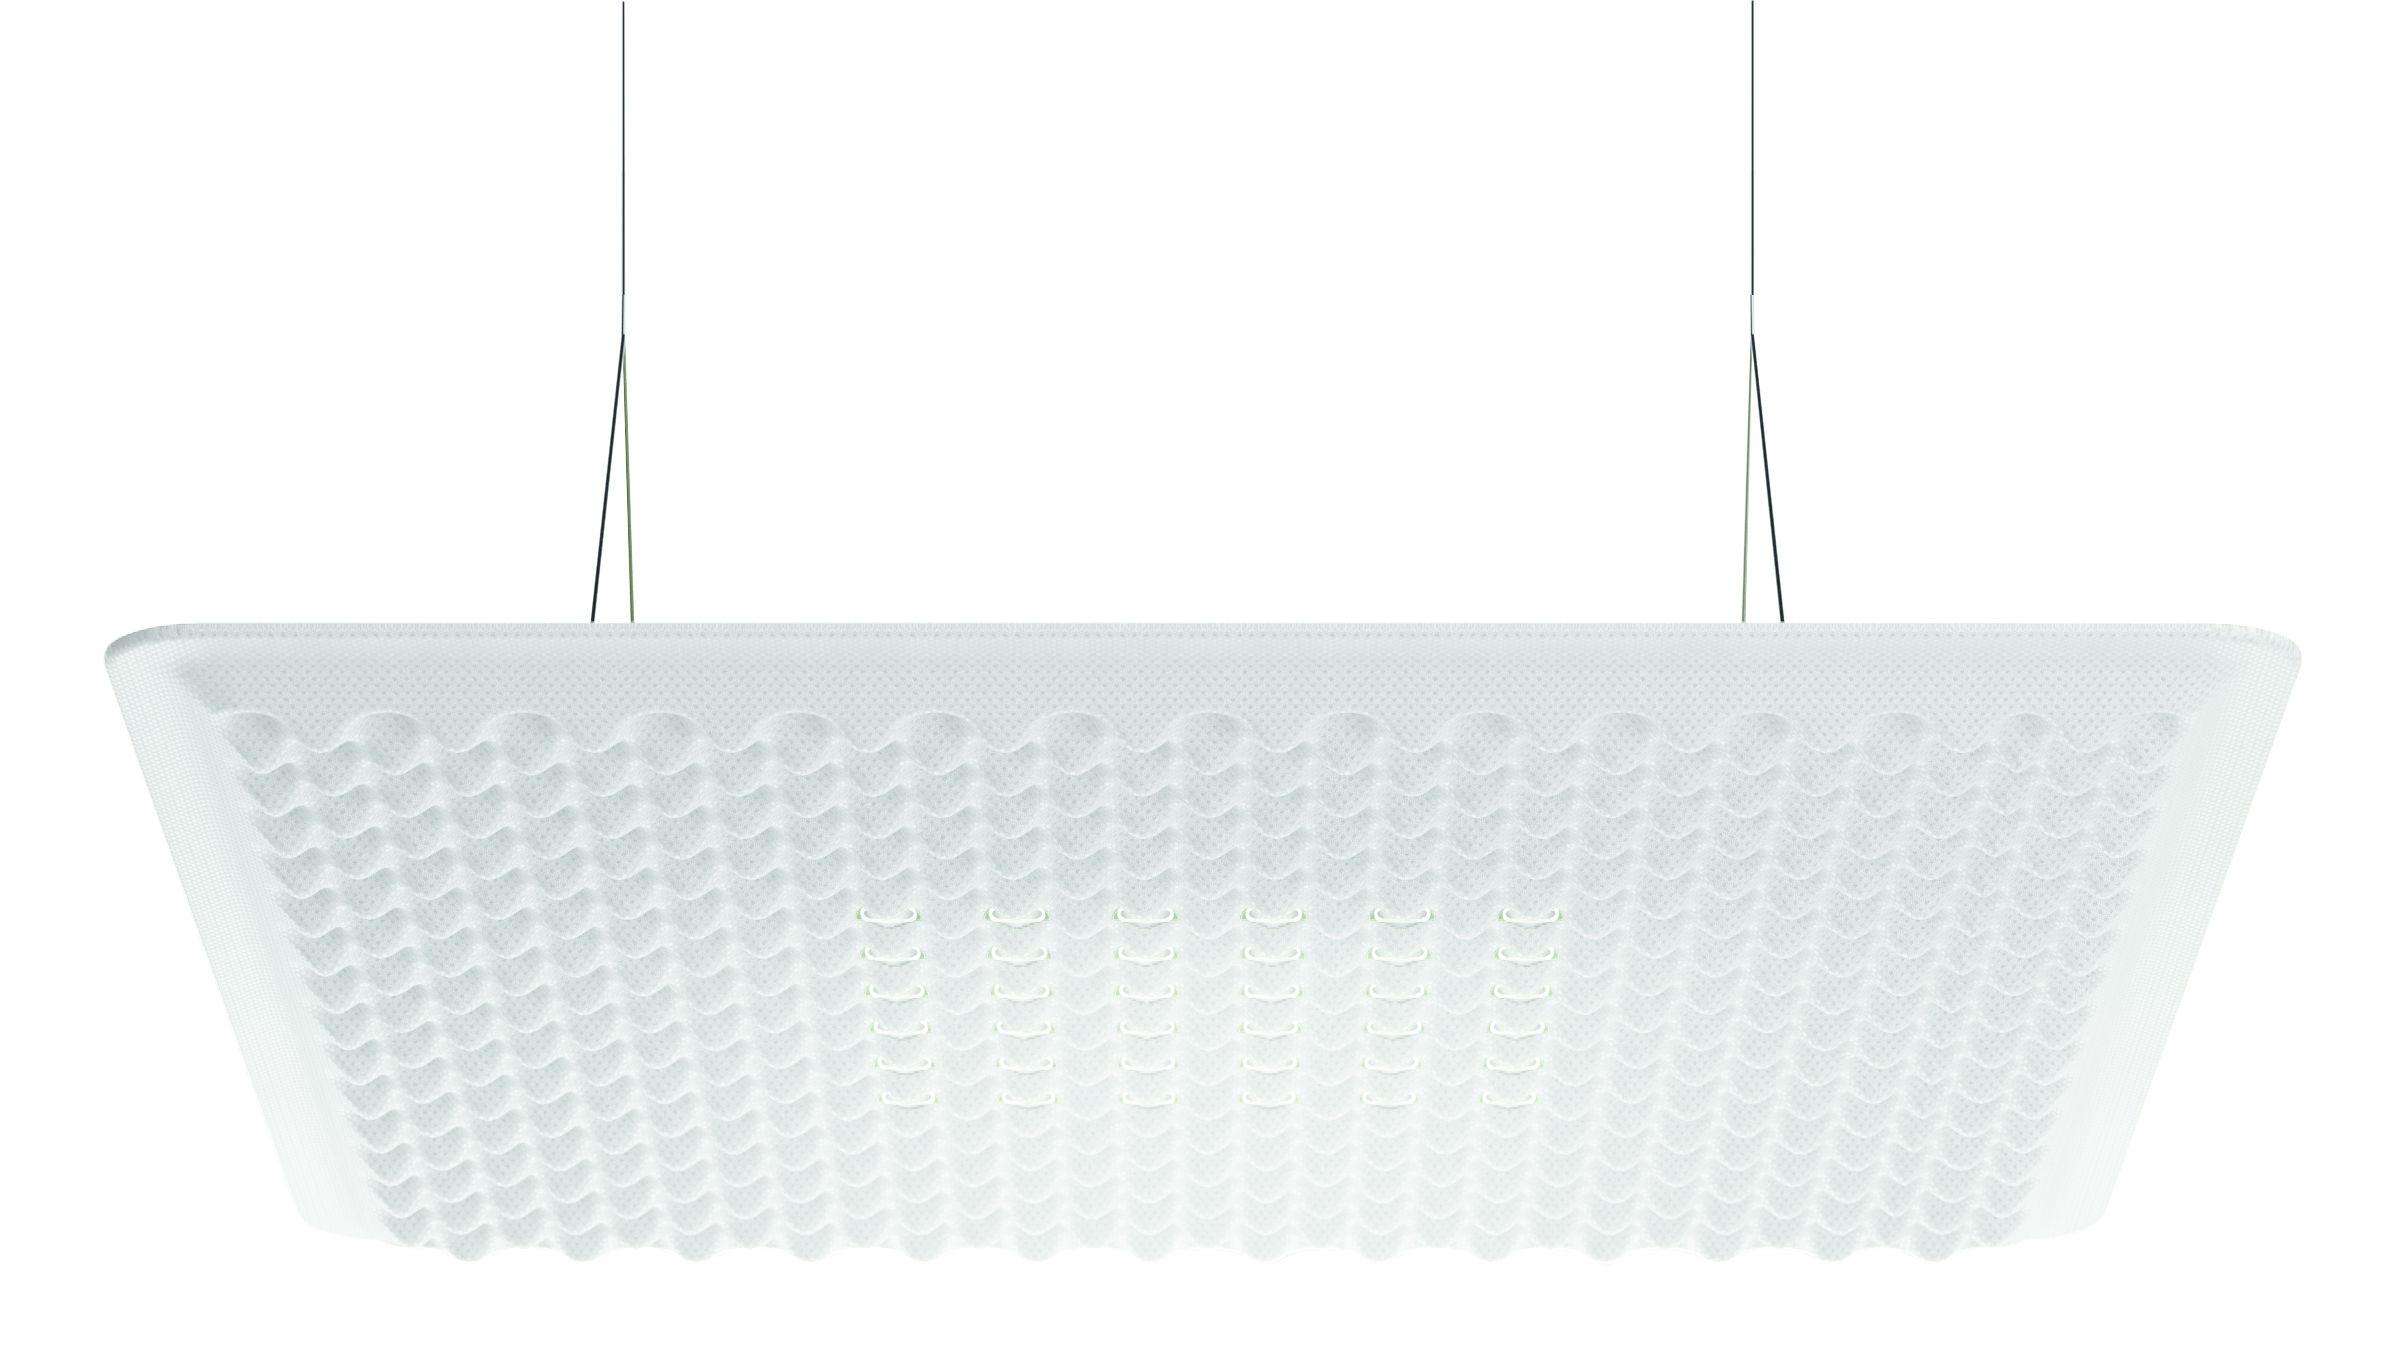 Lighting - Pendant Lighting - Eggboard LED Acoustic suspension - / Acoustic - 80 x 80 cm by Artemide - White - Elasticated fabric, PET